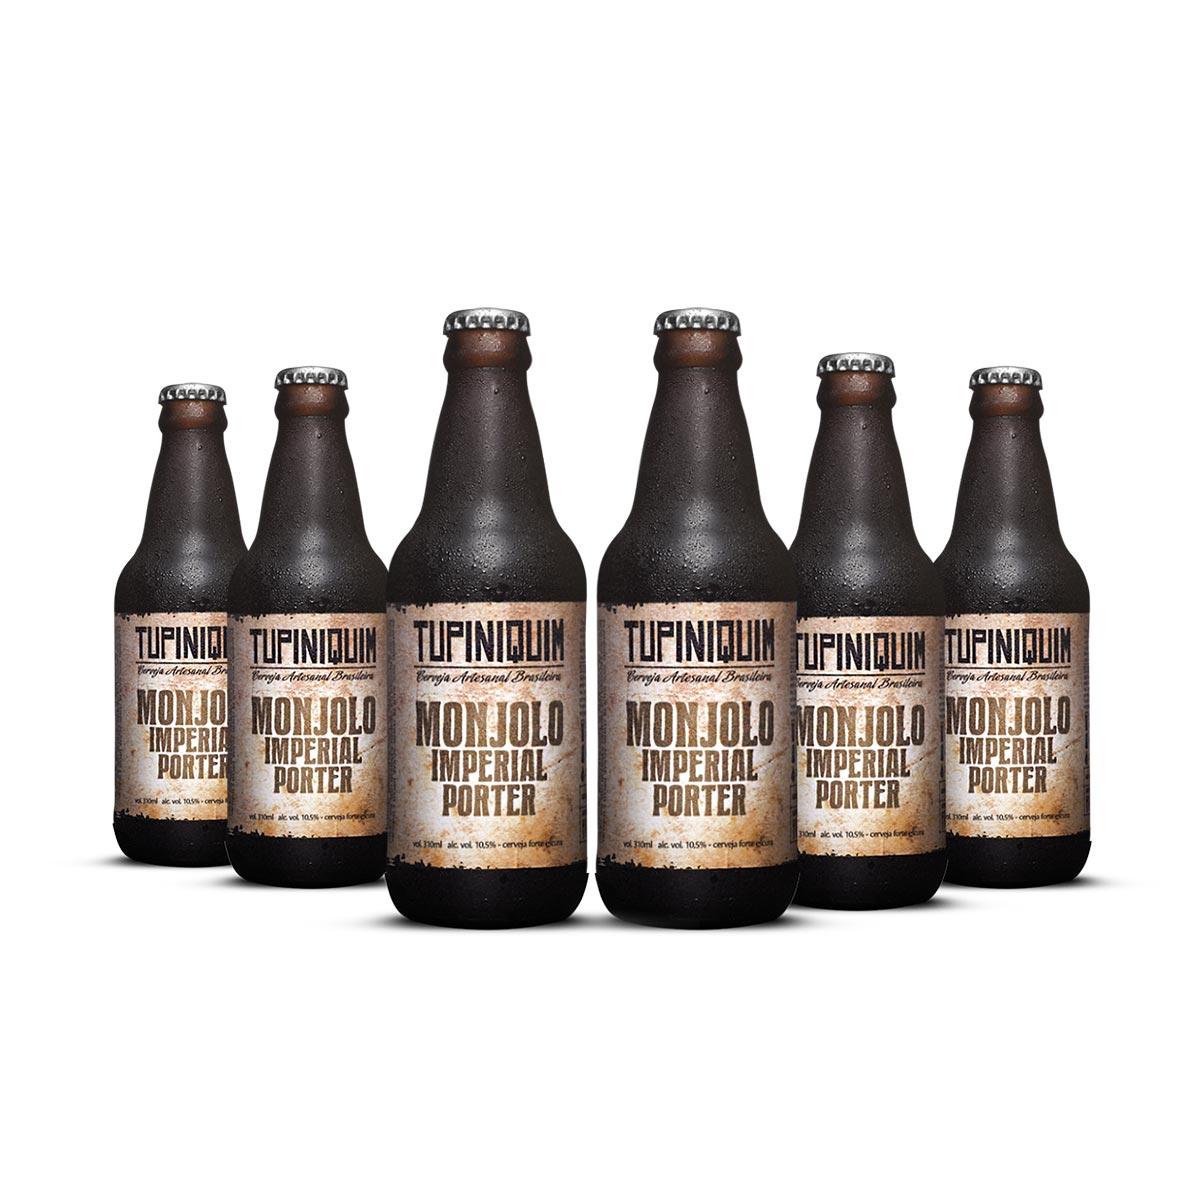 Pack Tupiniquim Monjolo Imperial Porter 6 cervejas 310ml